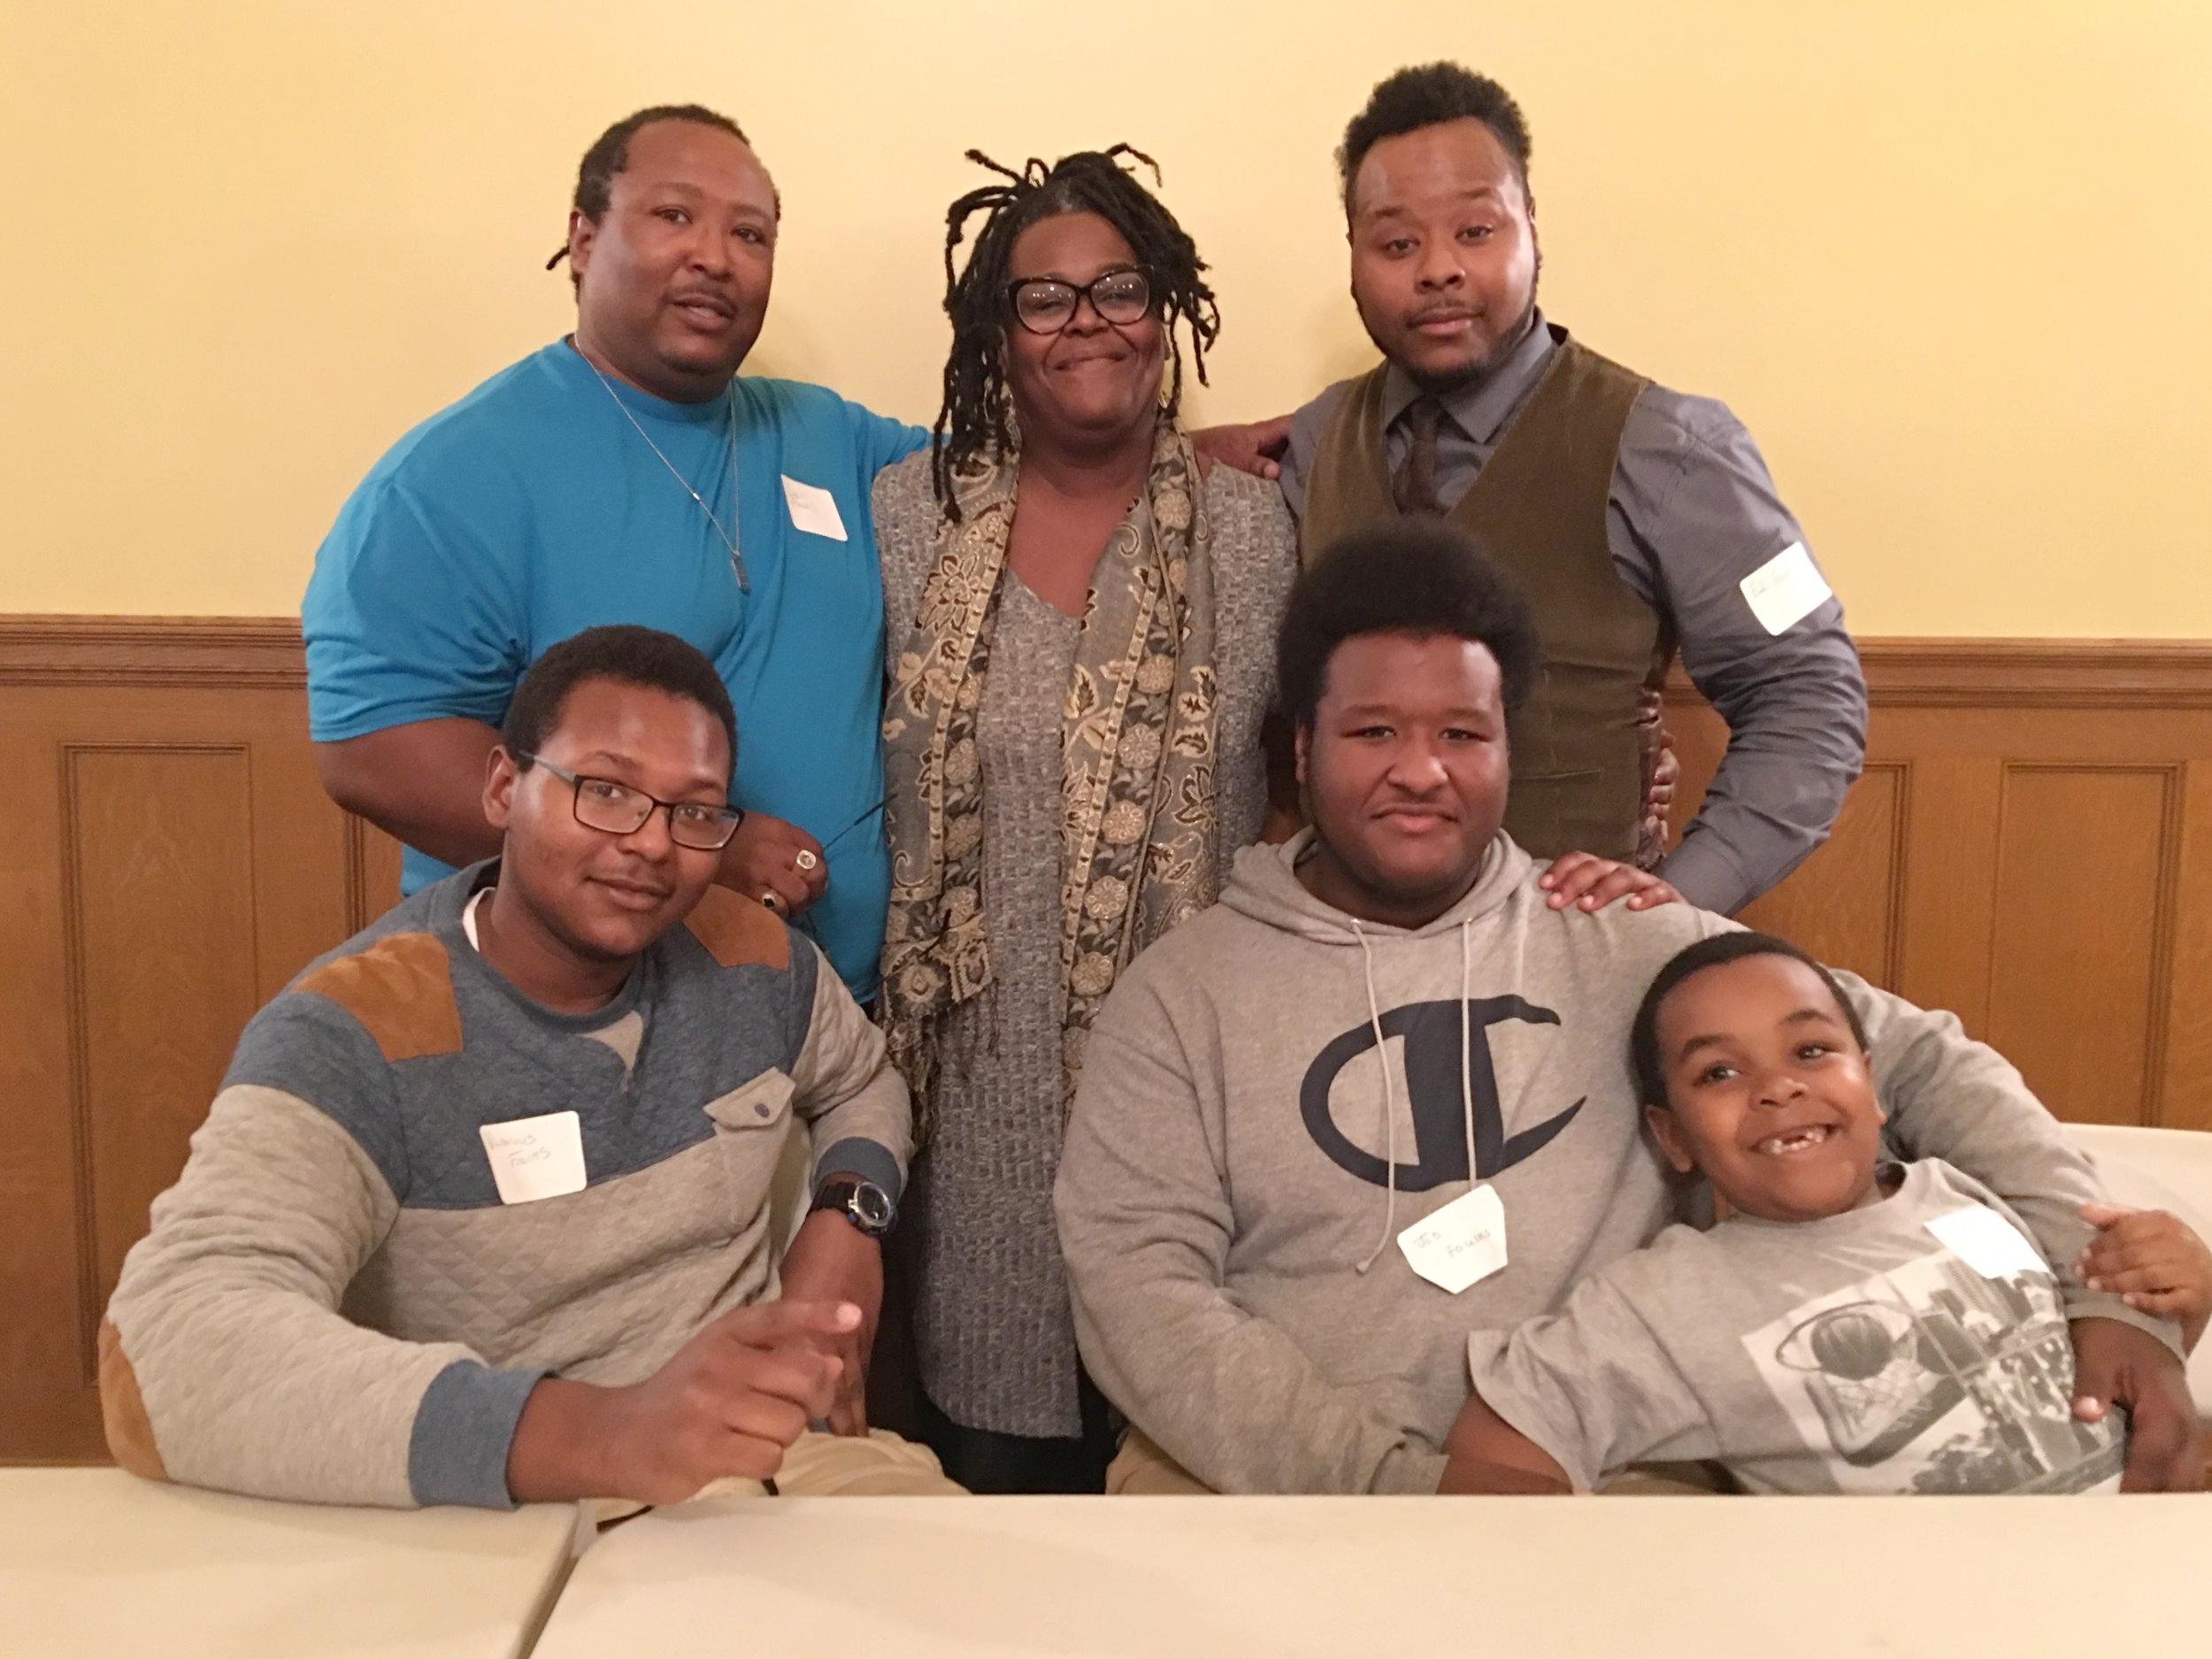 From Left: Elijah's parents Lowendell and Milisa Foulks, Elijah, Victorious, Job and Judah.